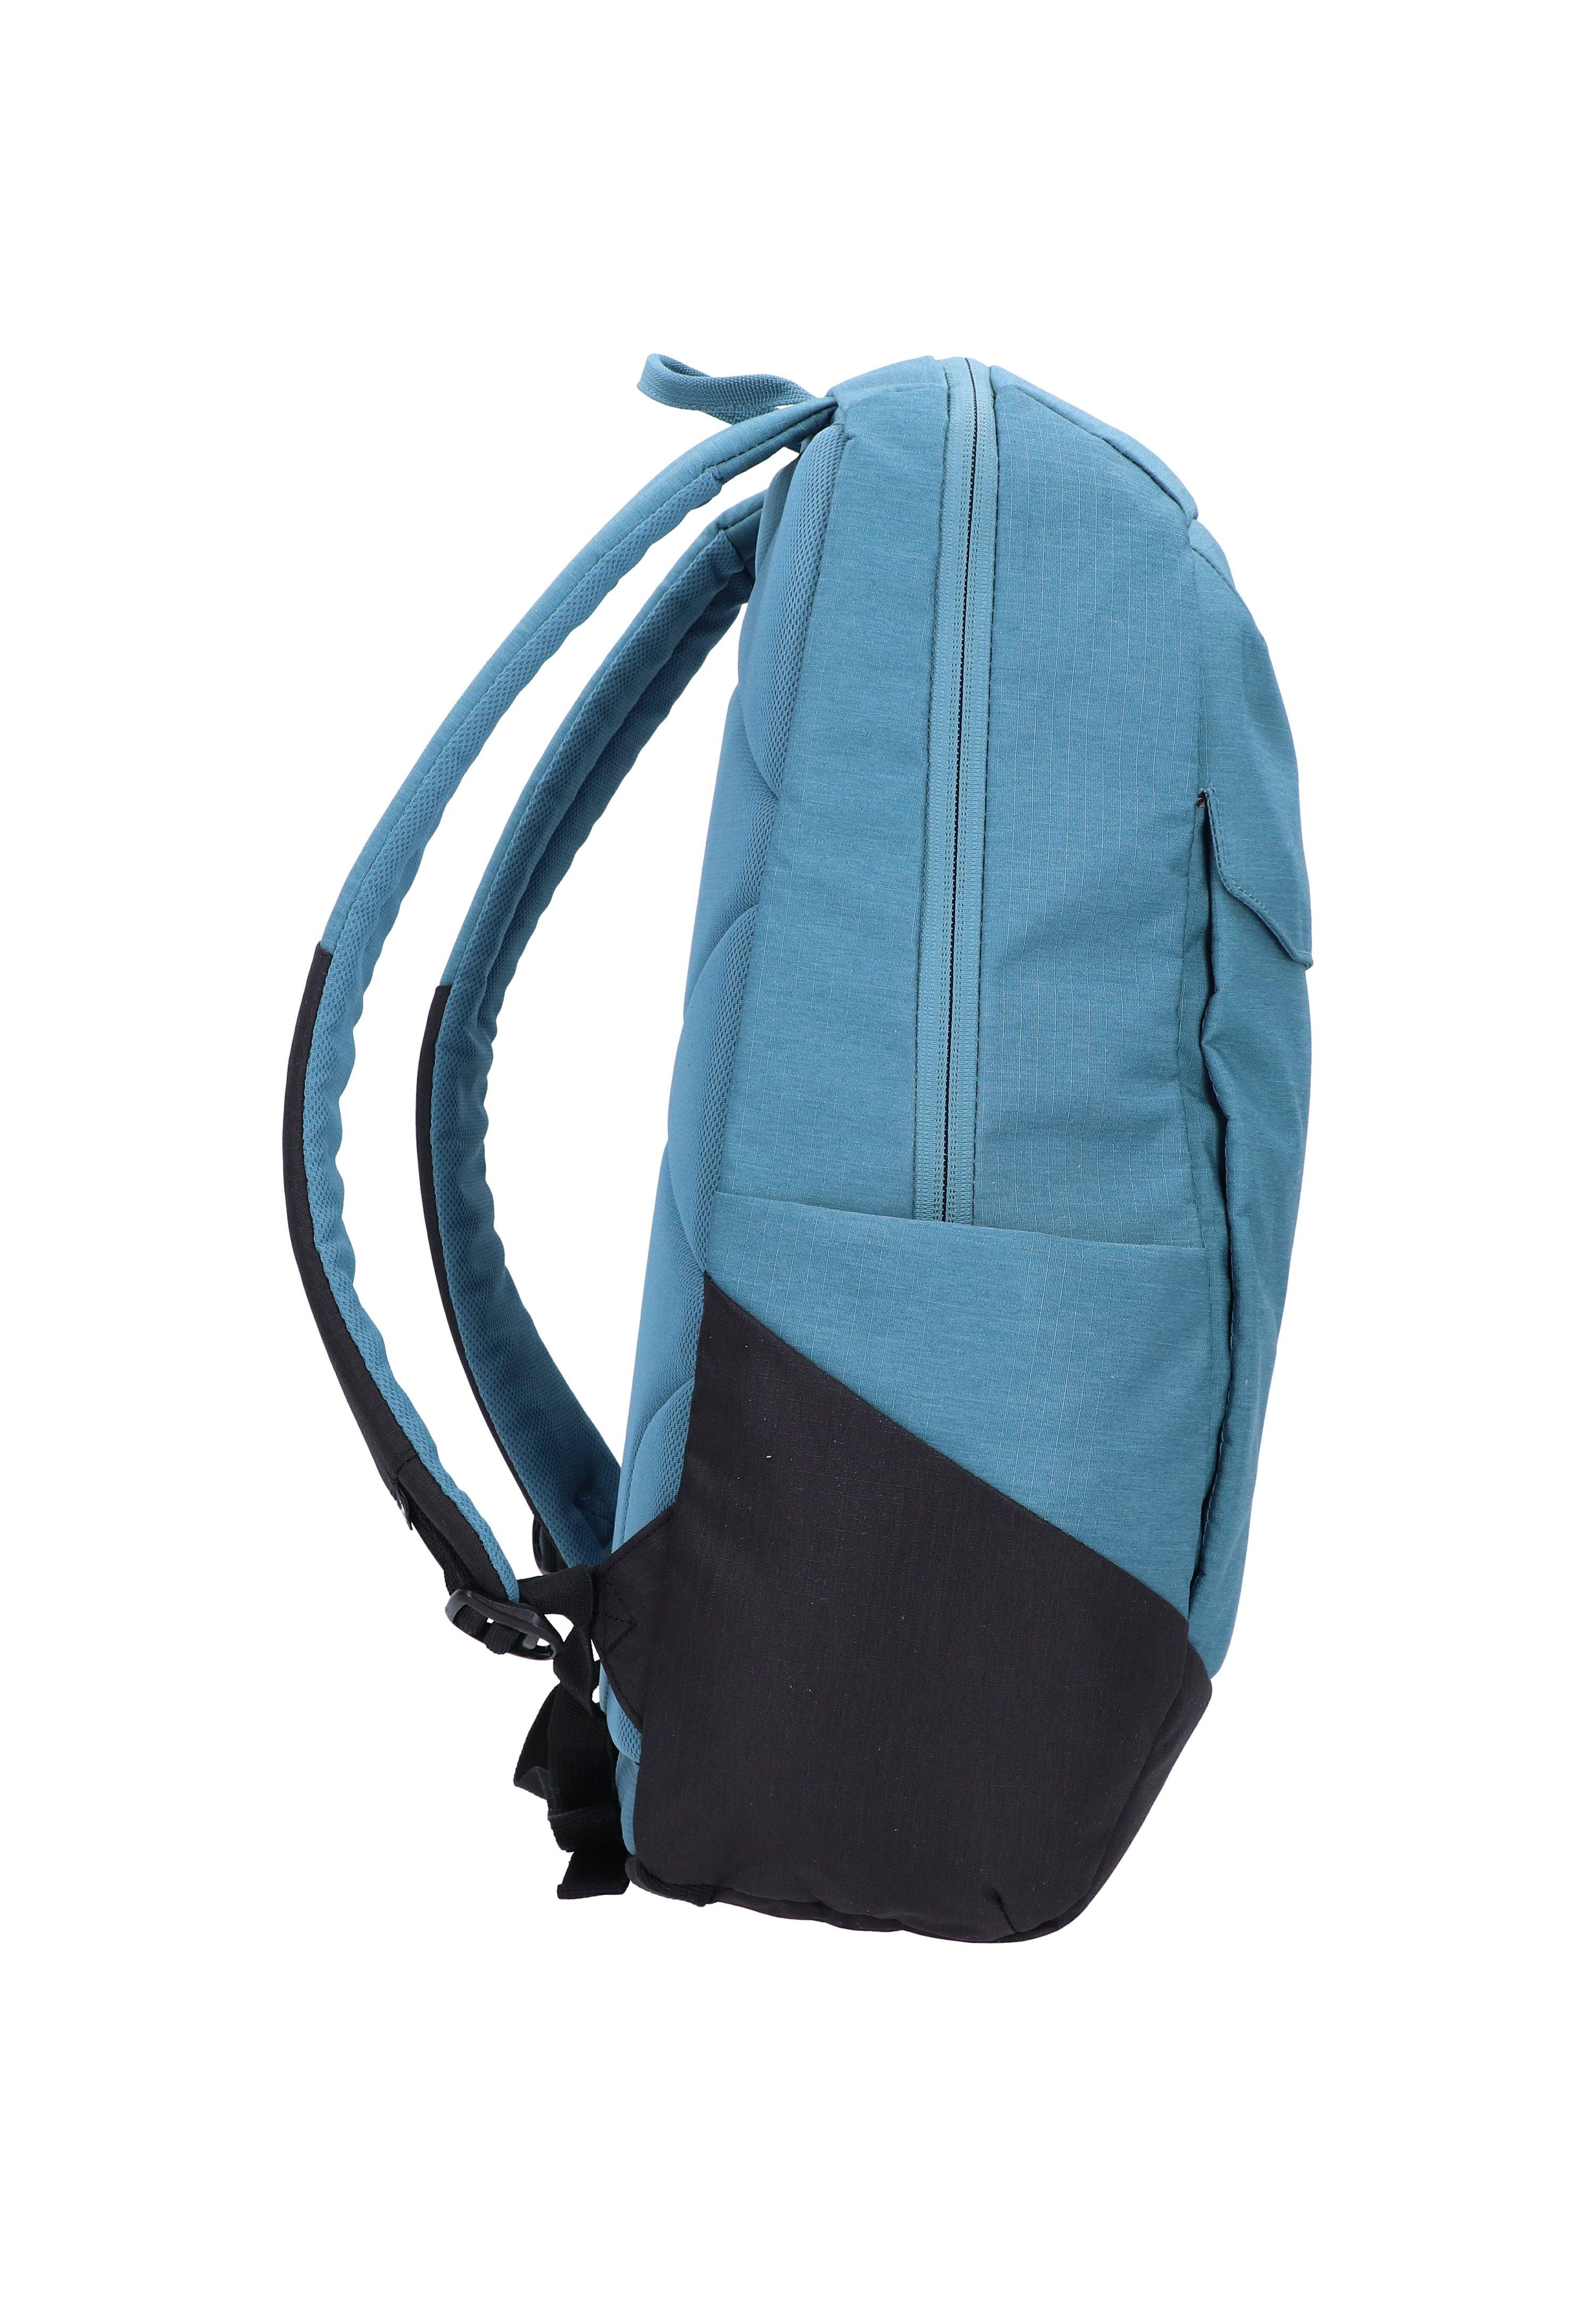 Thule Rugzak - blue/black - Dames Accessoires en tassen Korting